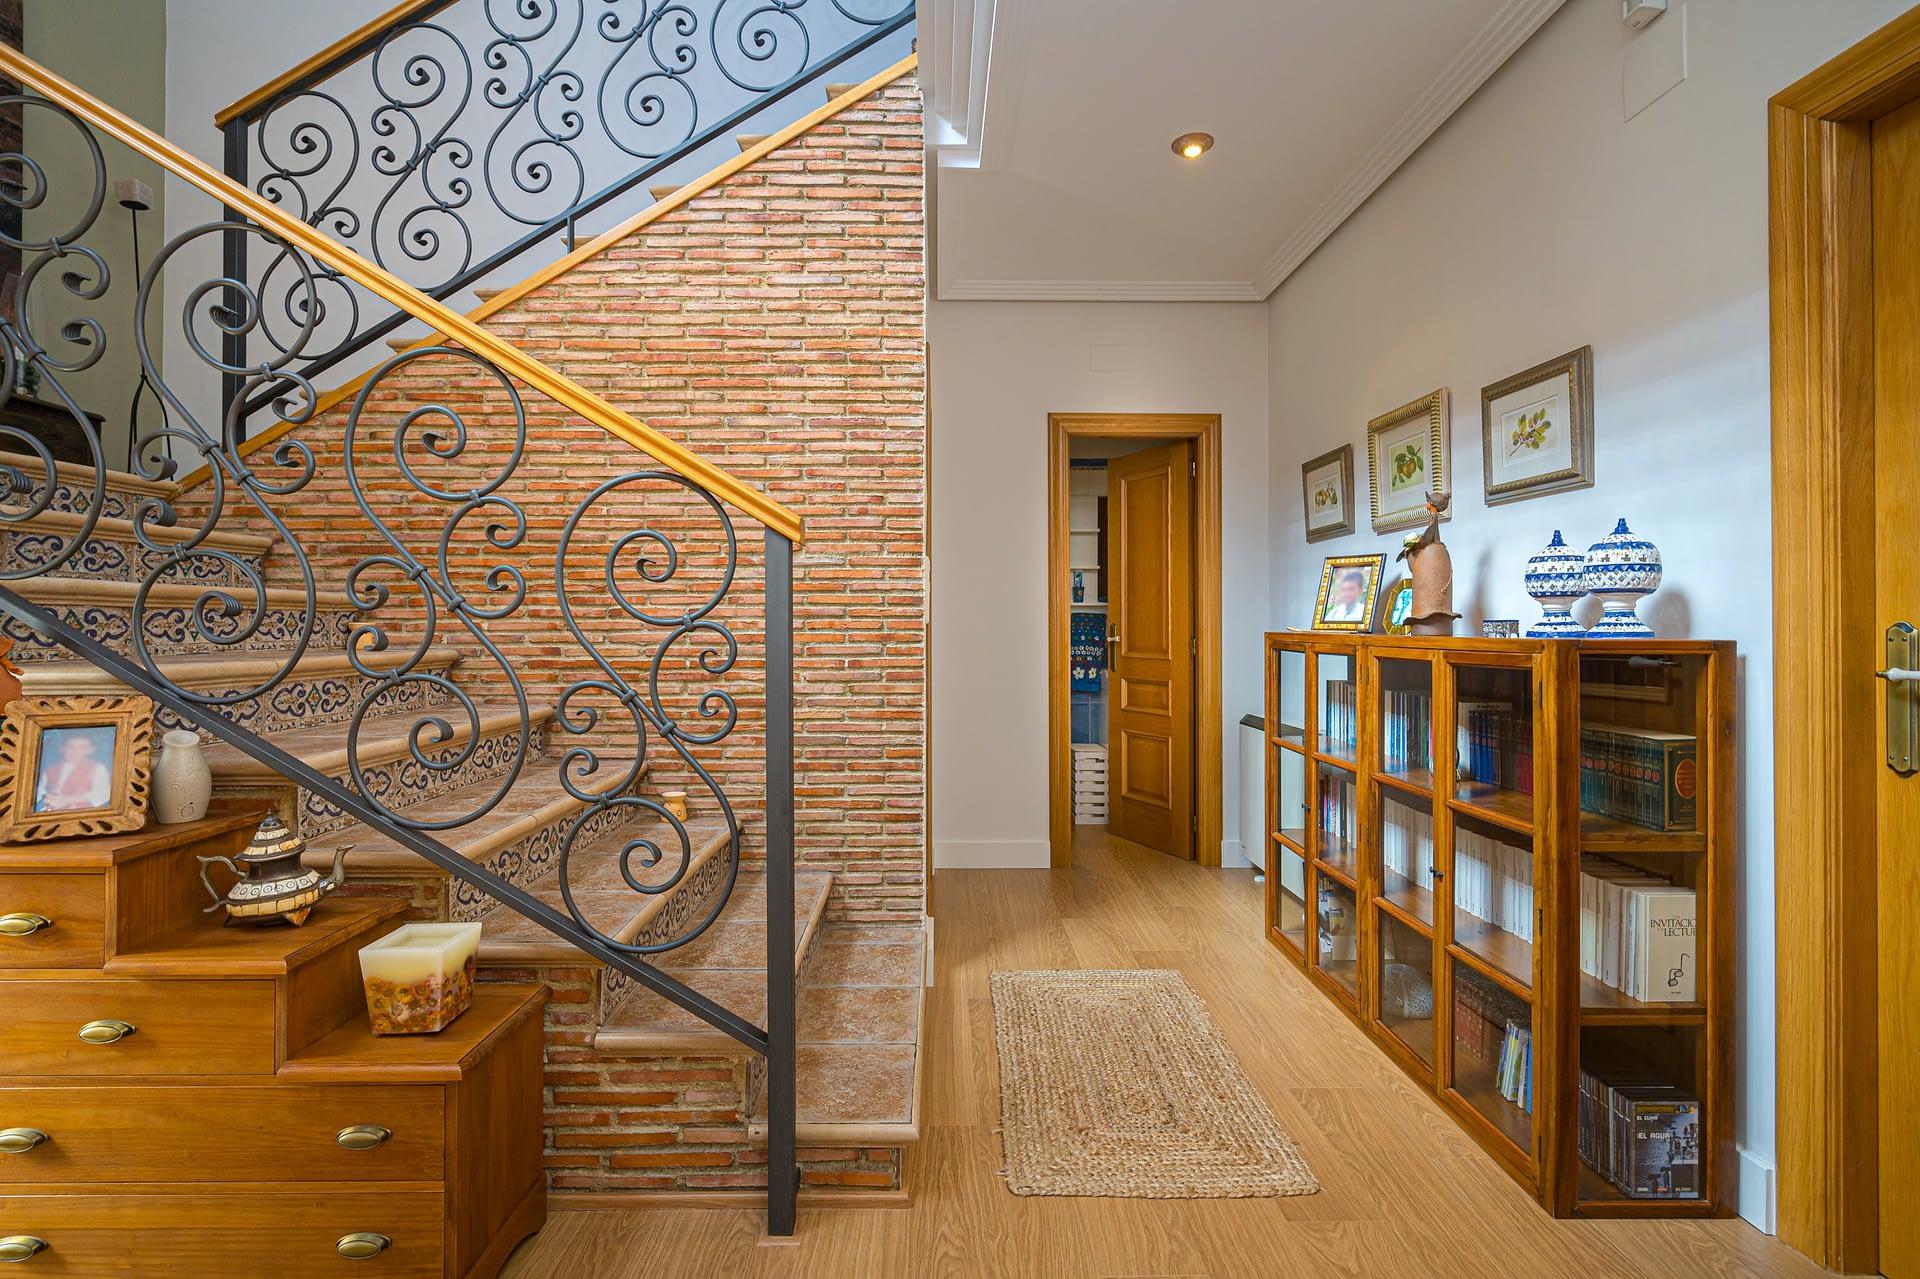 Pierluigi Cavarra - fotografo de Inmobiliaria - real estate photography costa blanca - ejemplo 9